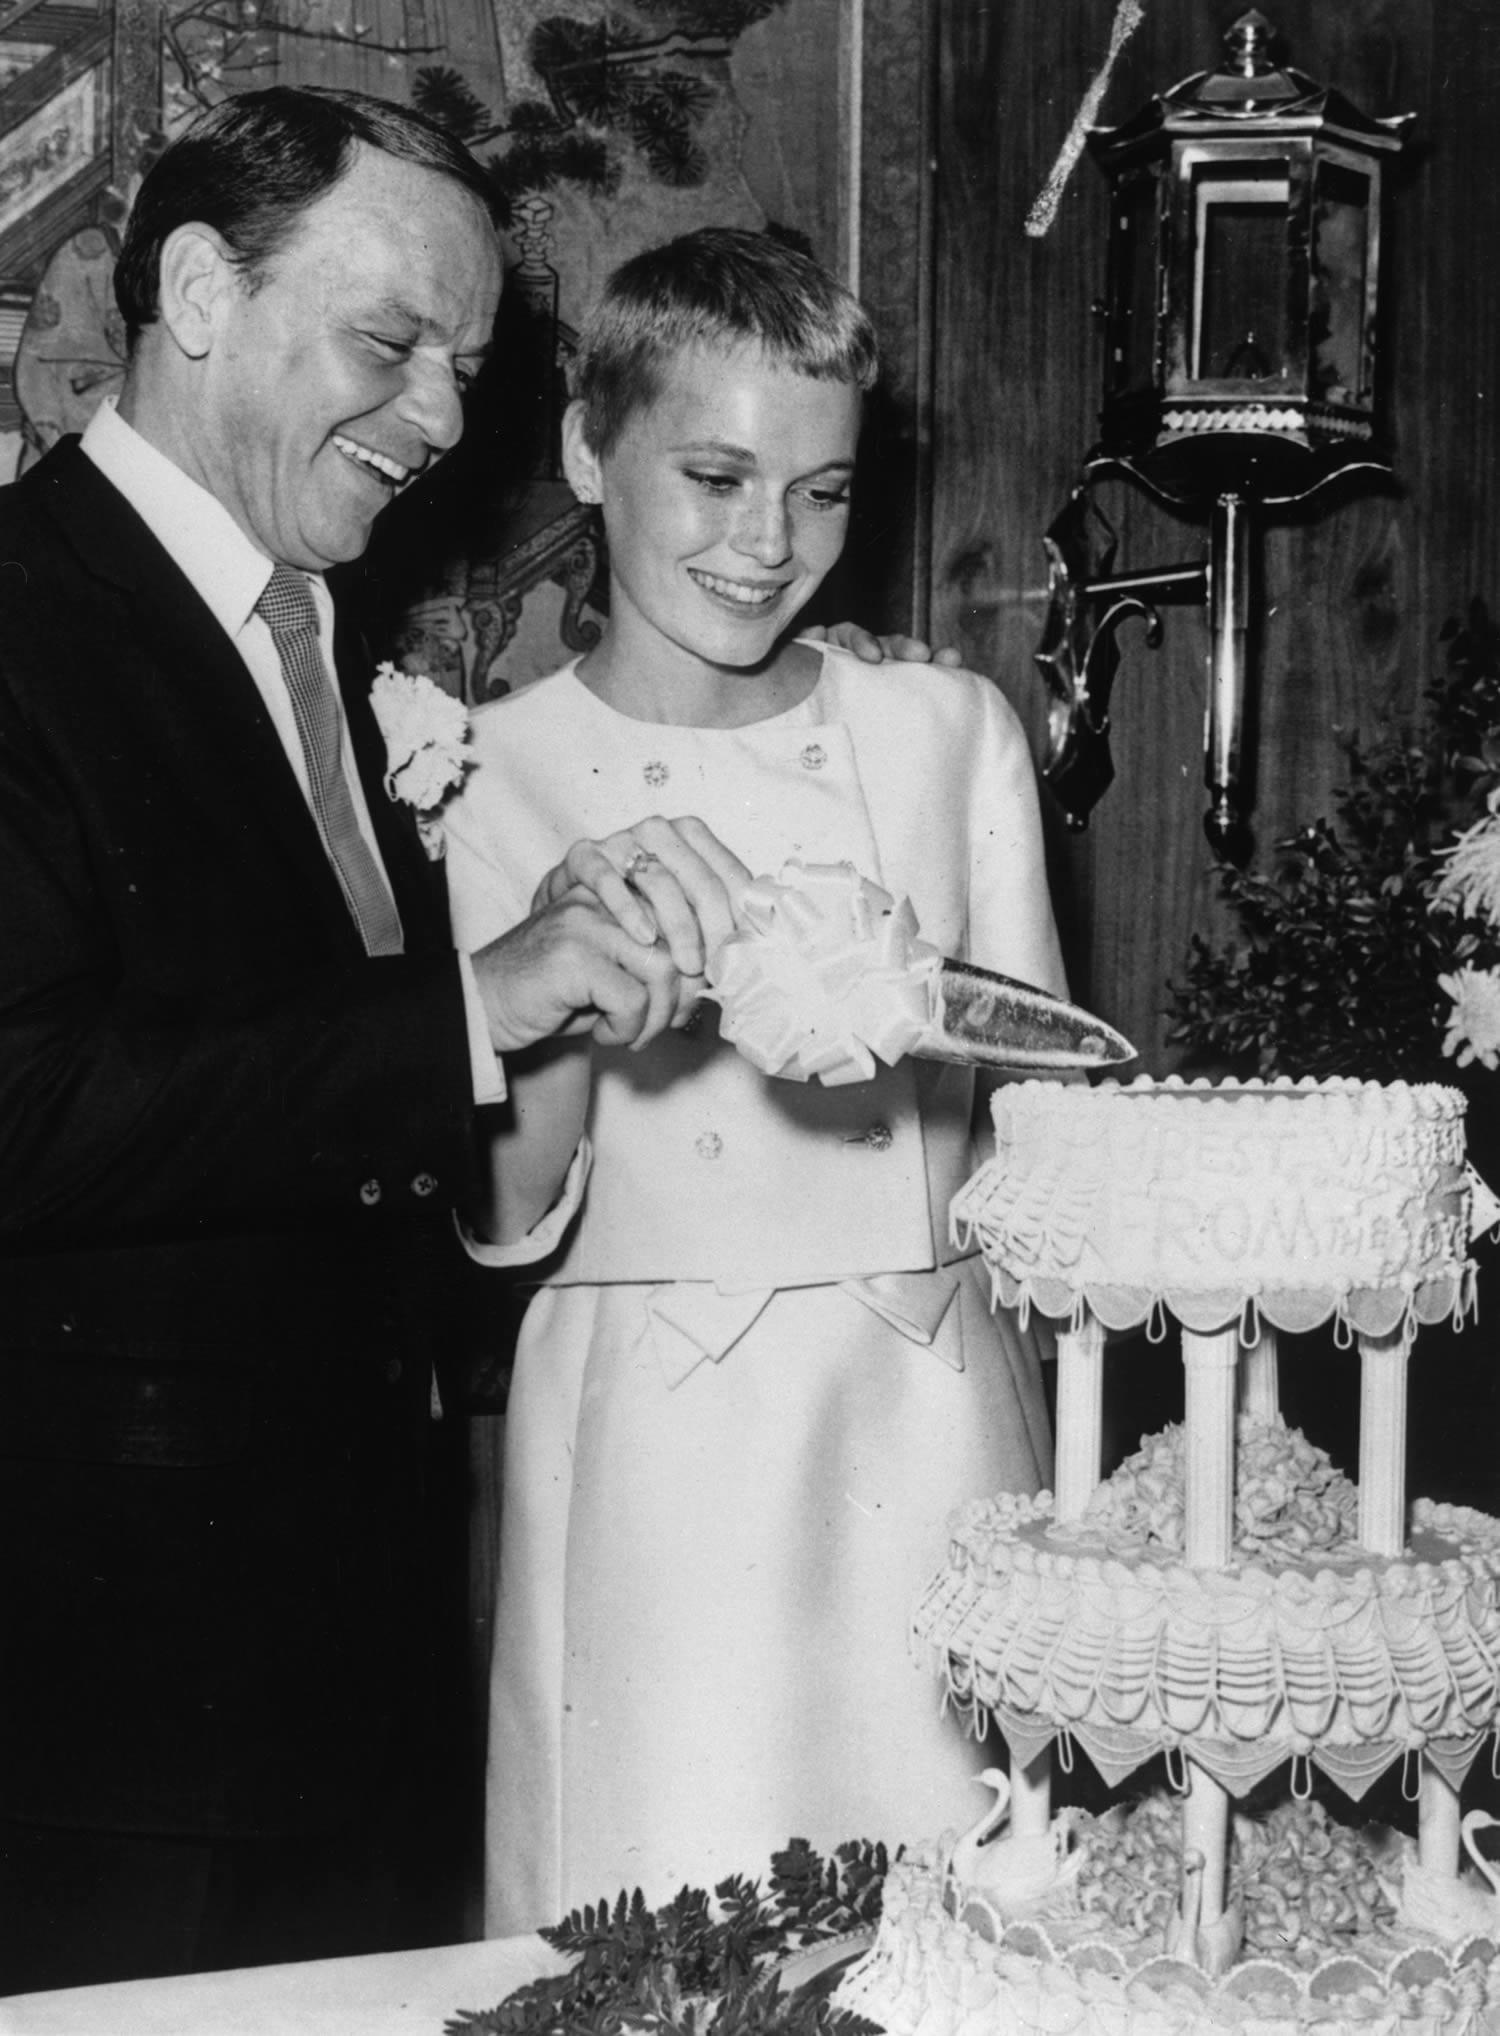 Mia Farrow wedding